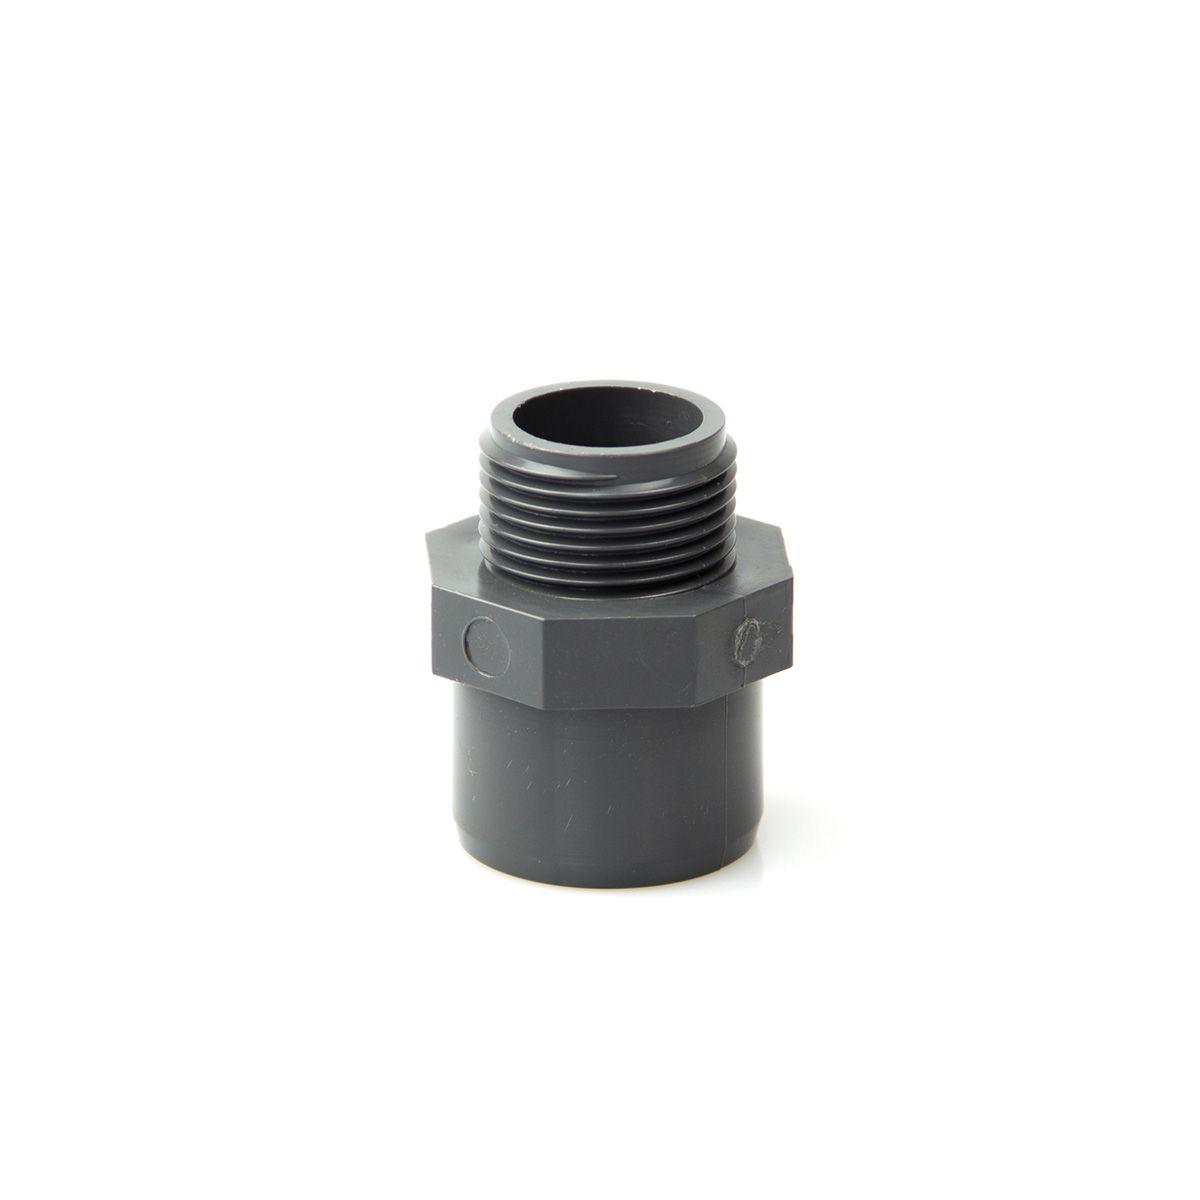 Reduktion Kleben/Gewinde AG, aus PVC, grau, d 16 x D 20 mm, 3/8' AG, PN 16